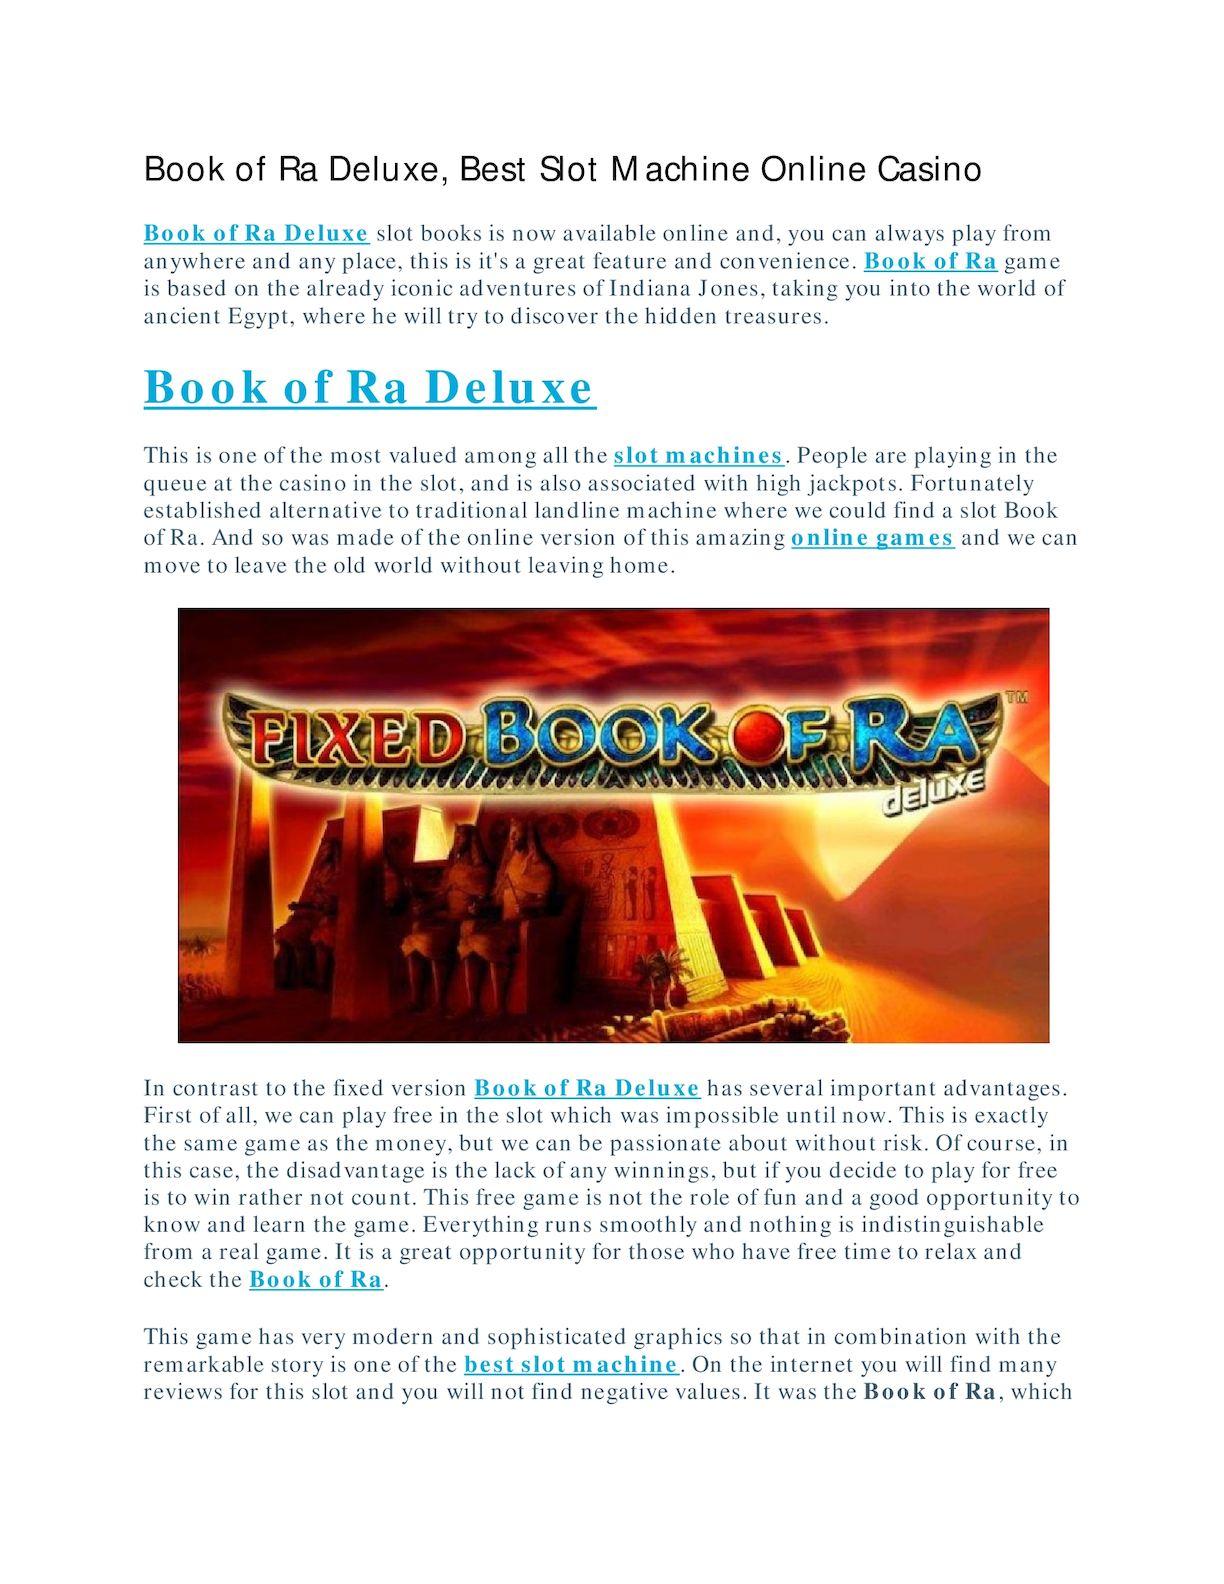 Calameo Book Of Ra Deluxe